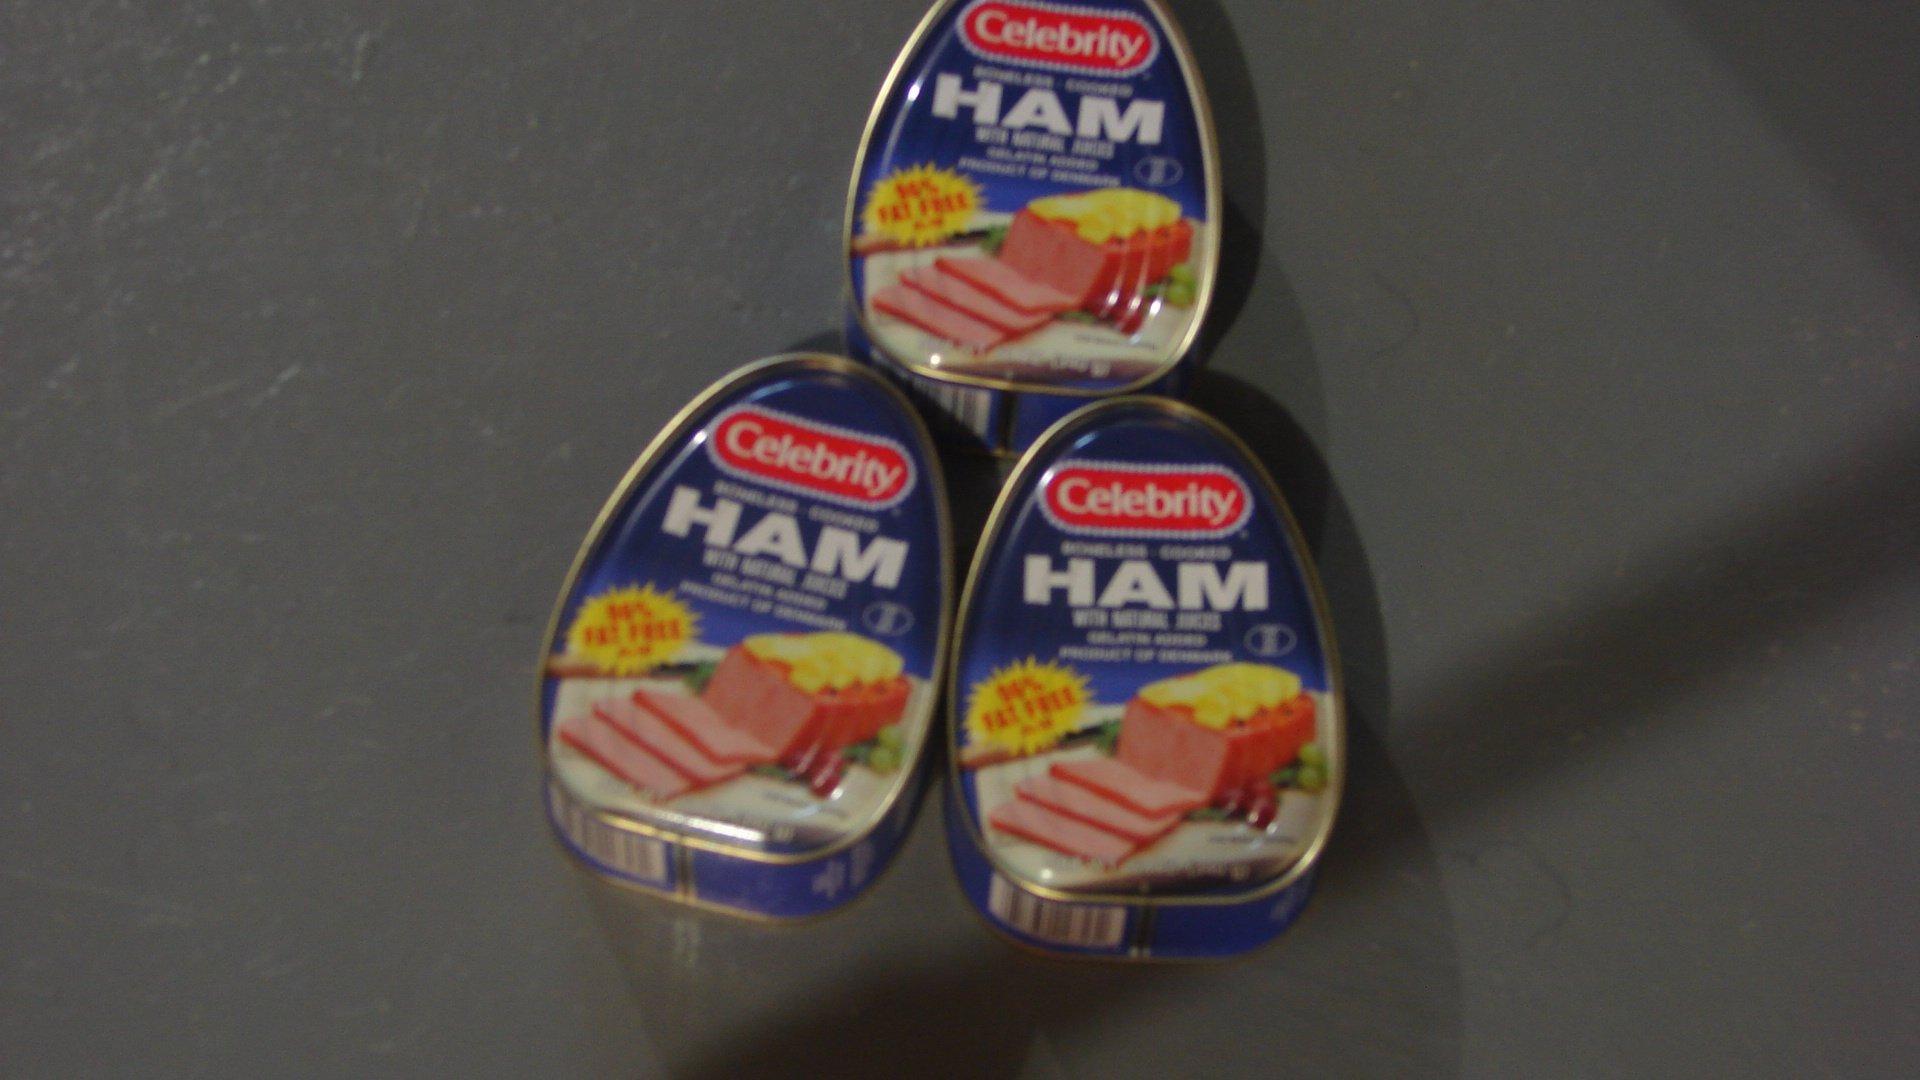 Celebrity Boneless Cooked Ham Fat Free 12oz( Pack of 3)